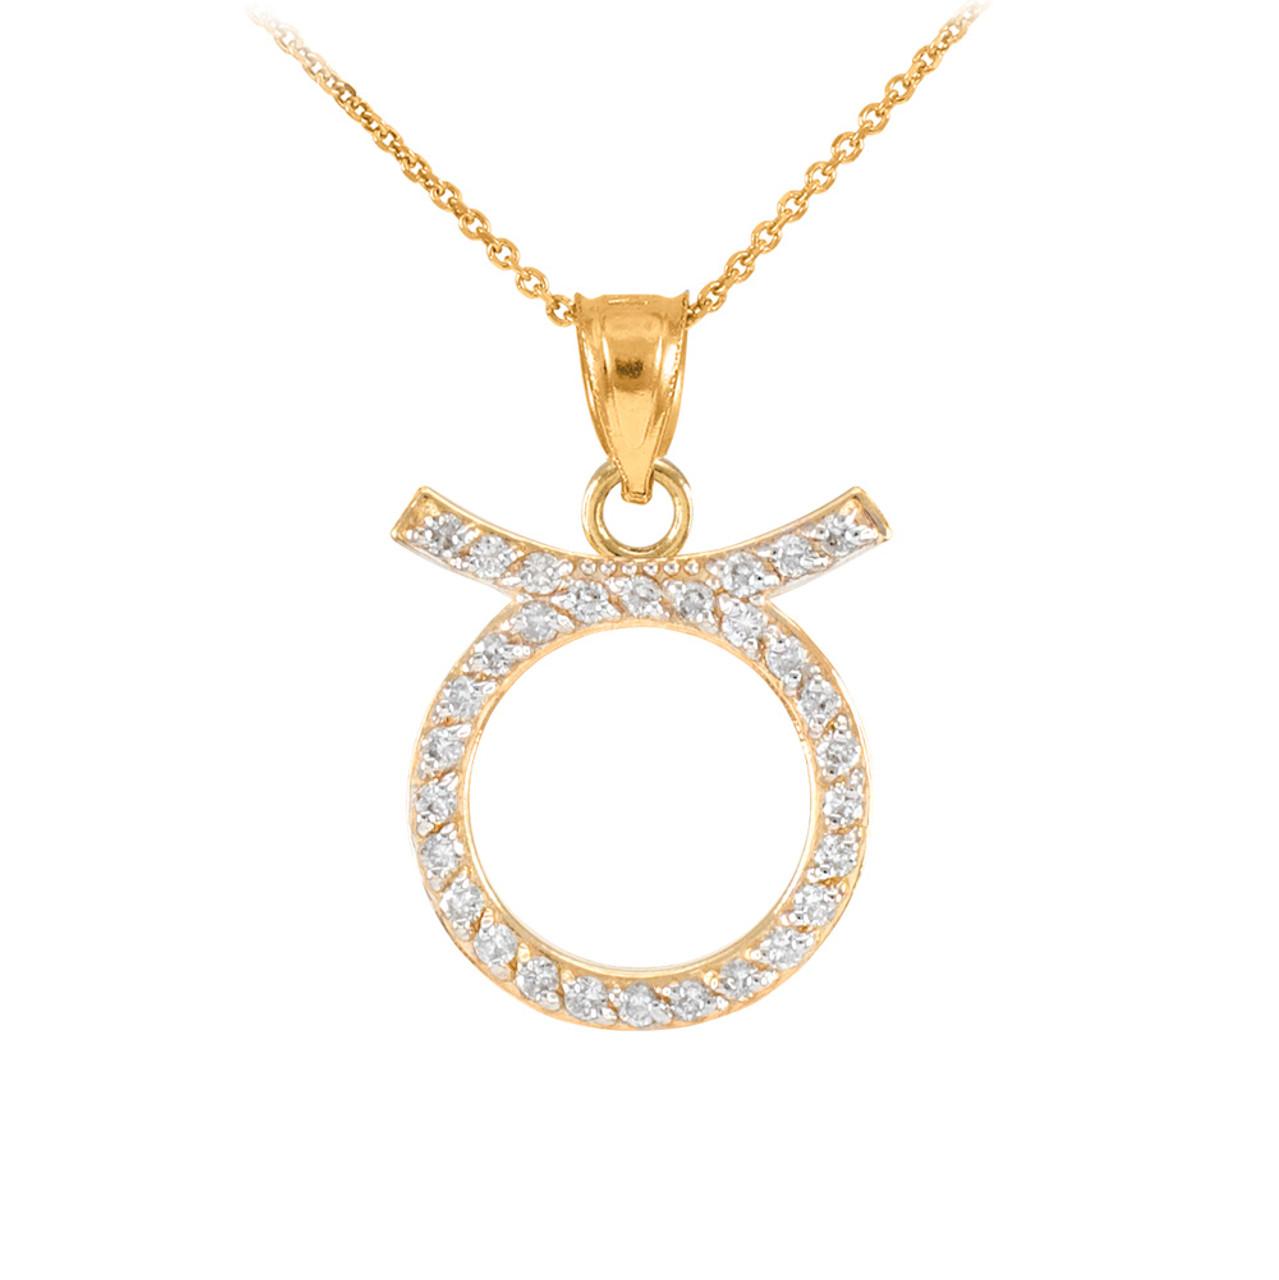 8383405732aae1 14K Gold Taurus Zodiac Sign Diamond Pendant Necklace